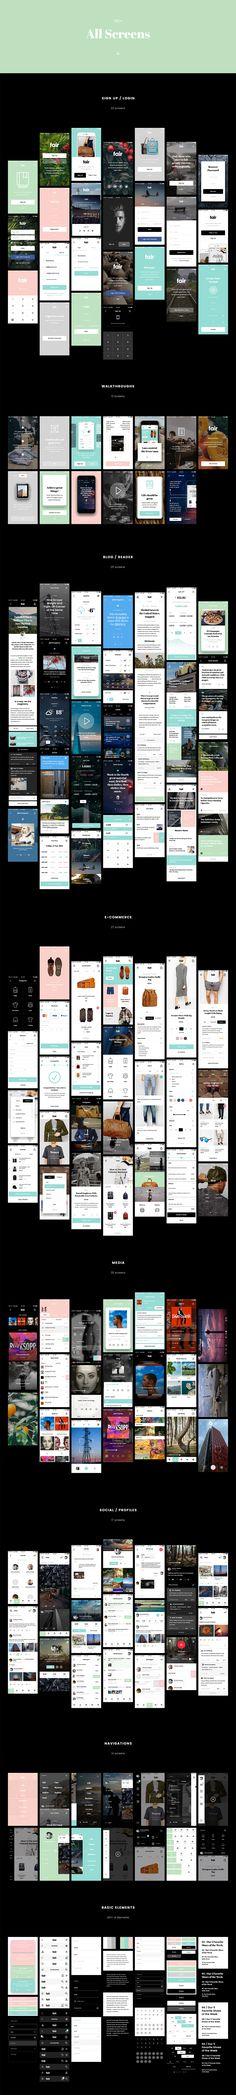 Fair UI Kit (140+ iOS screens) by Komol Kuchkarov on @creativemarket